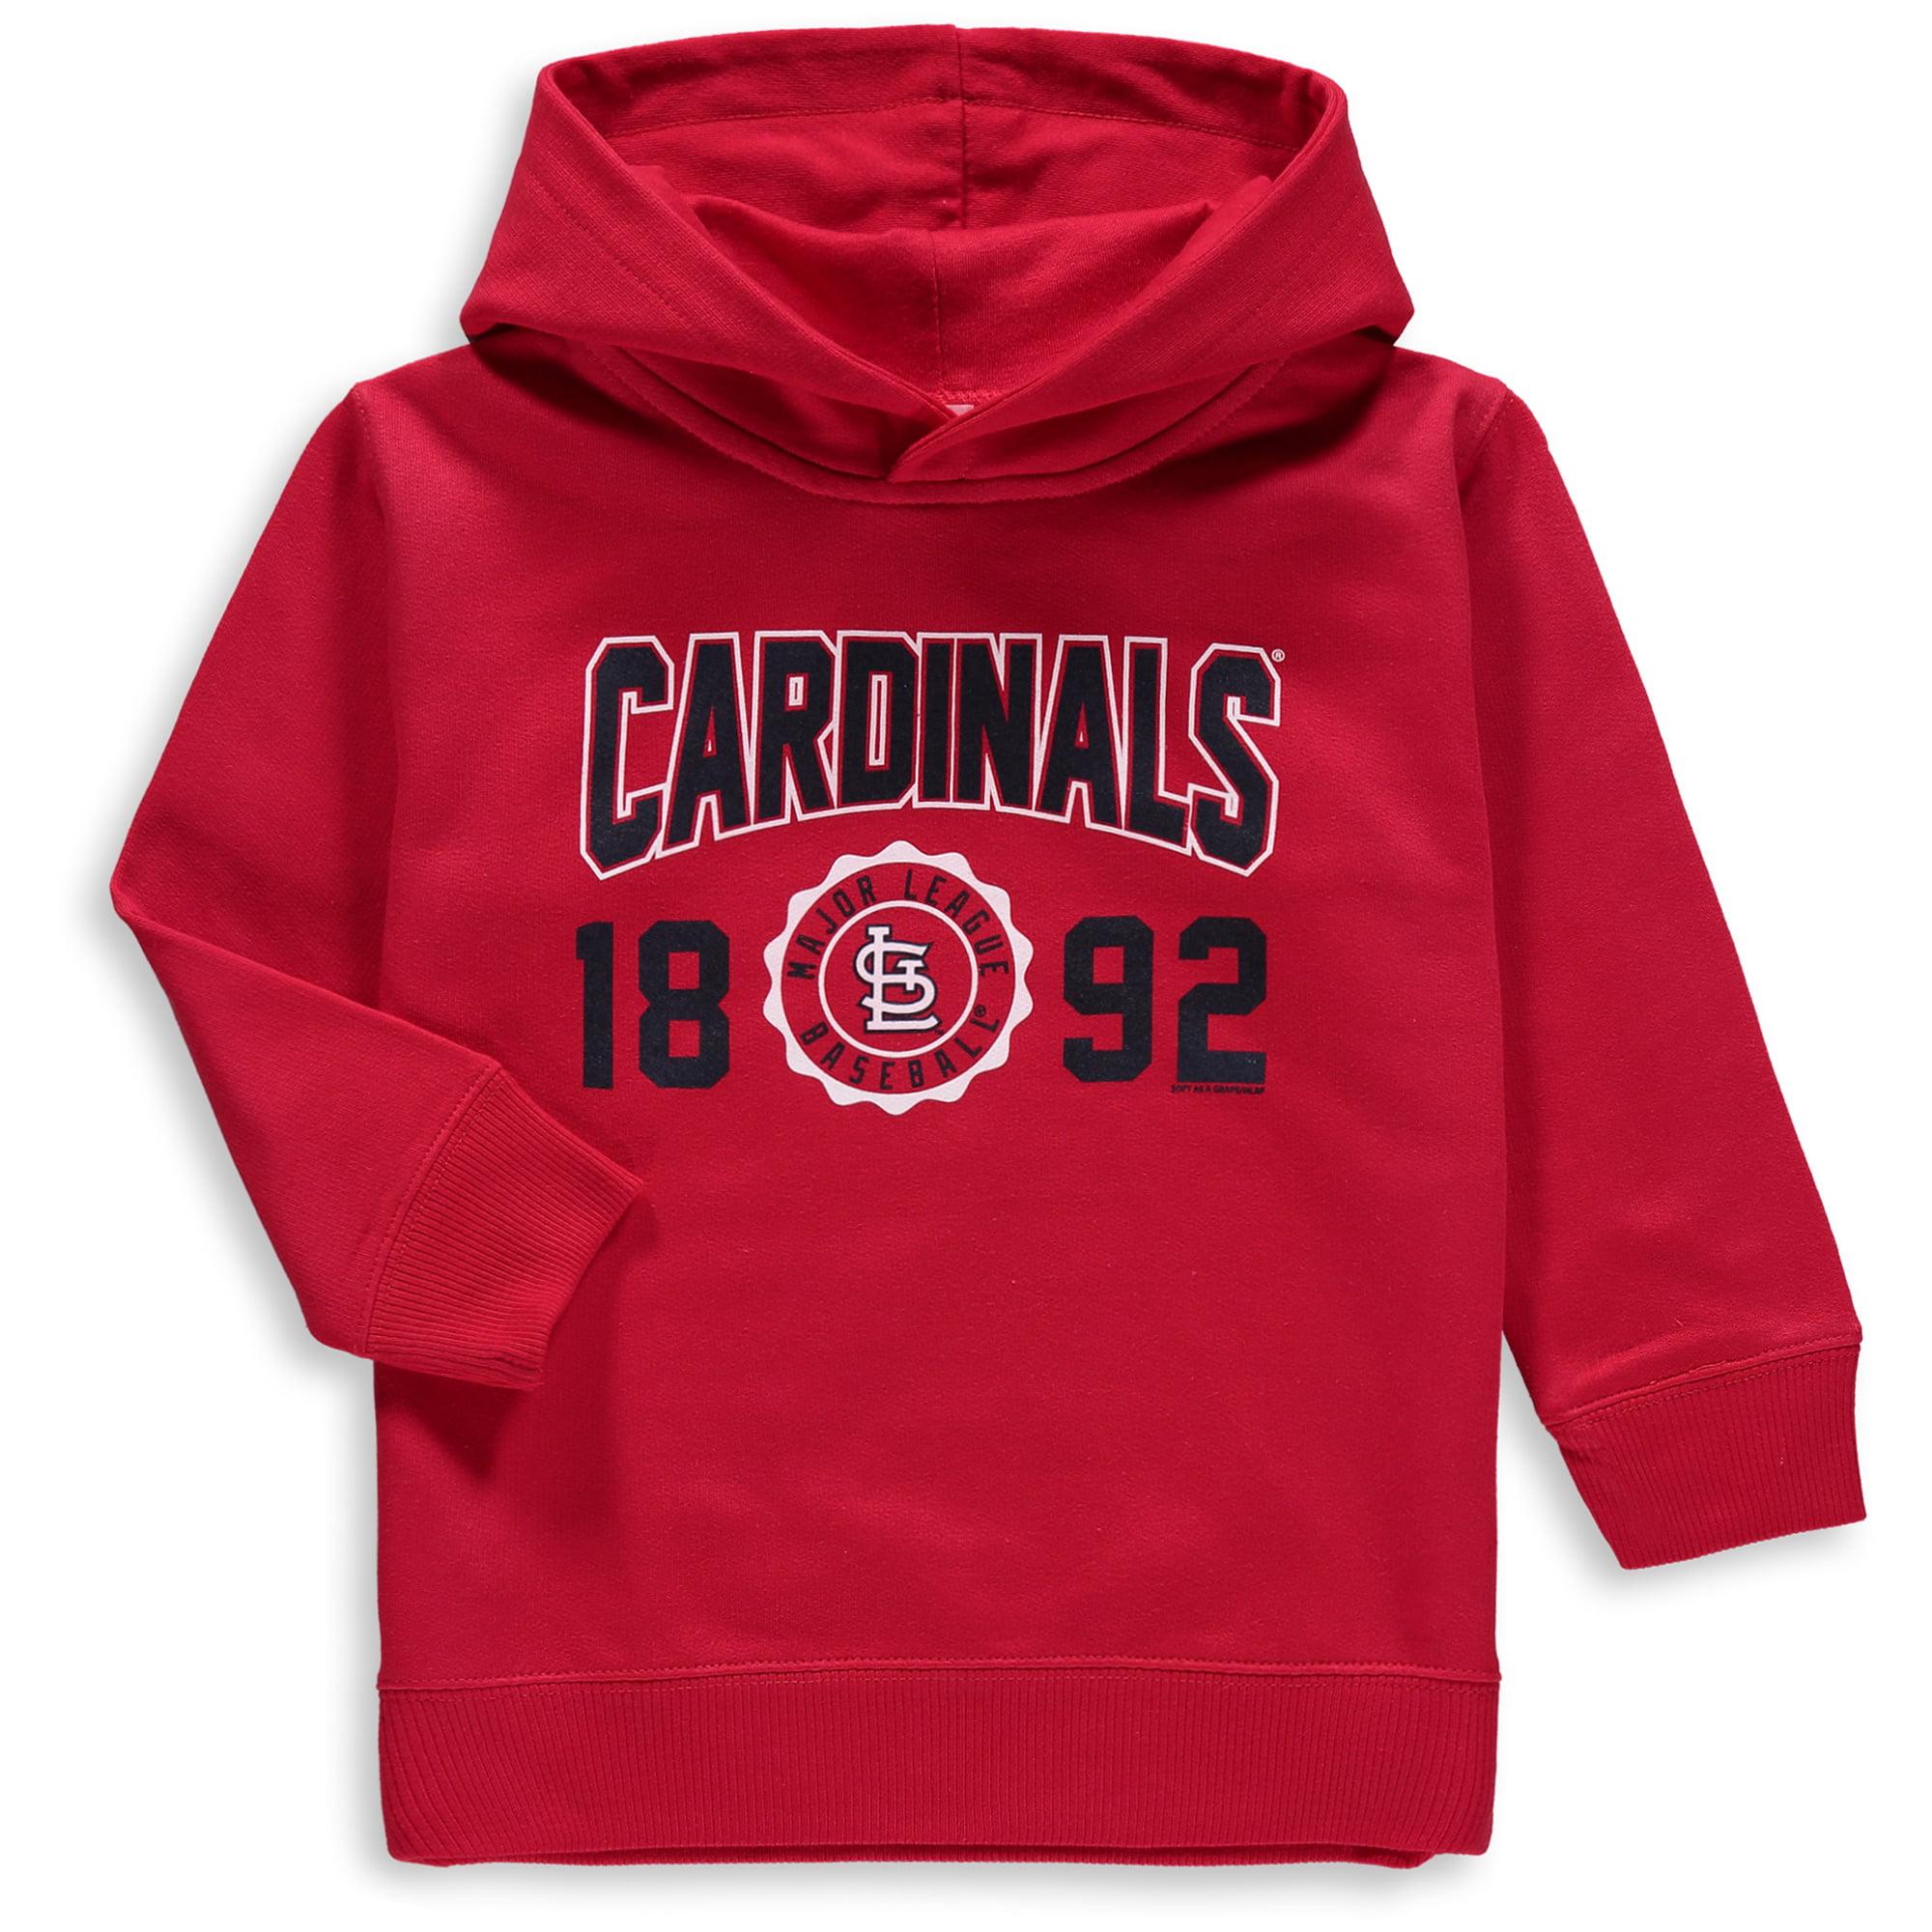 St. Louis Cardinals Soft as a Grape Toddler Fleece Pullover Hoodie - Red